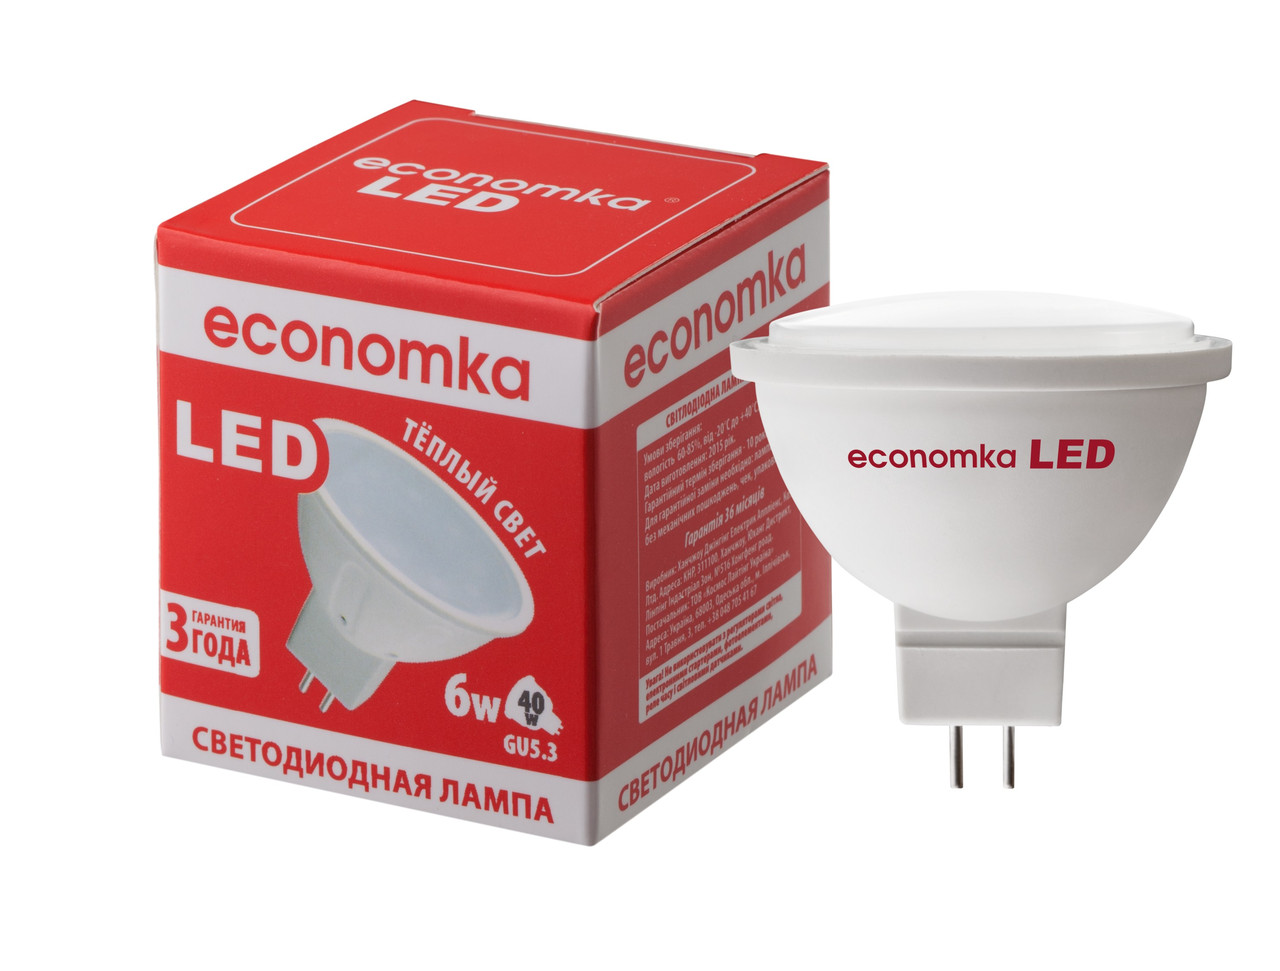 Светодиодная лампа Economka LED MR16 6w GU5.3 2800К